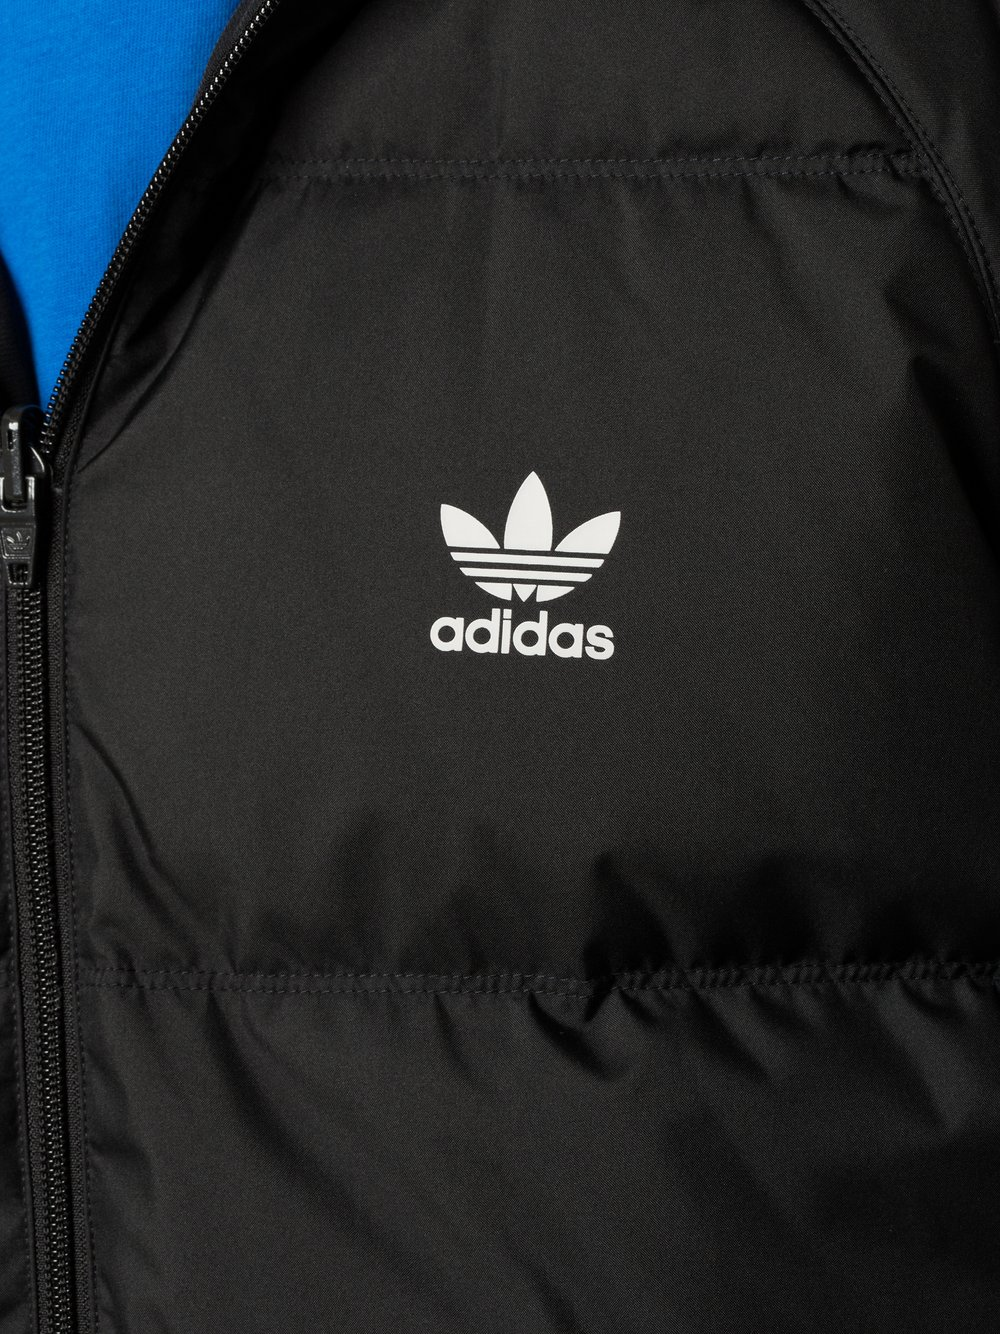 adidas Originals Damska dwustronna kurtka puchowa kup online